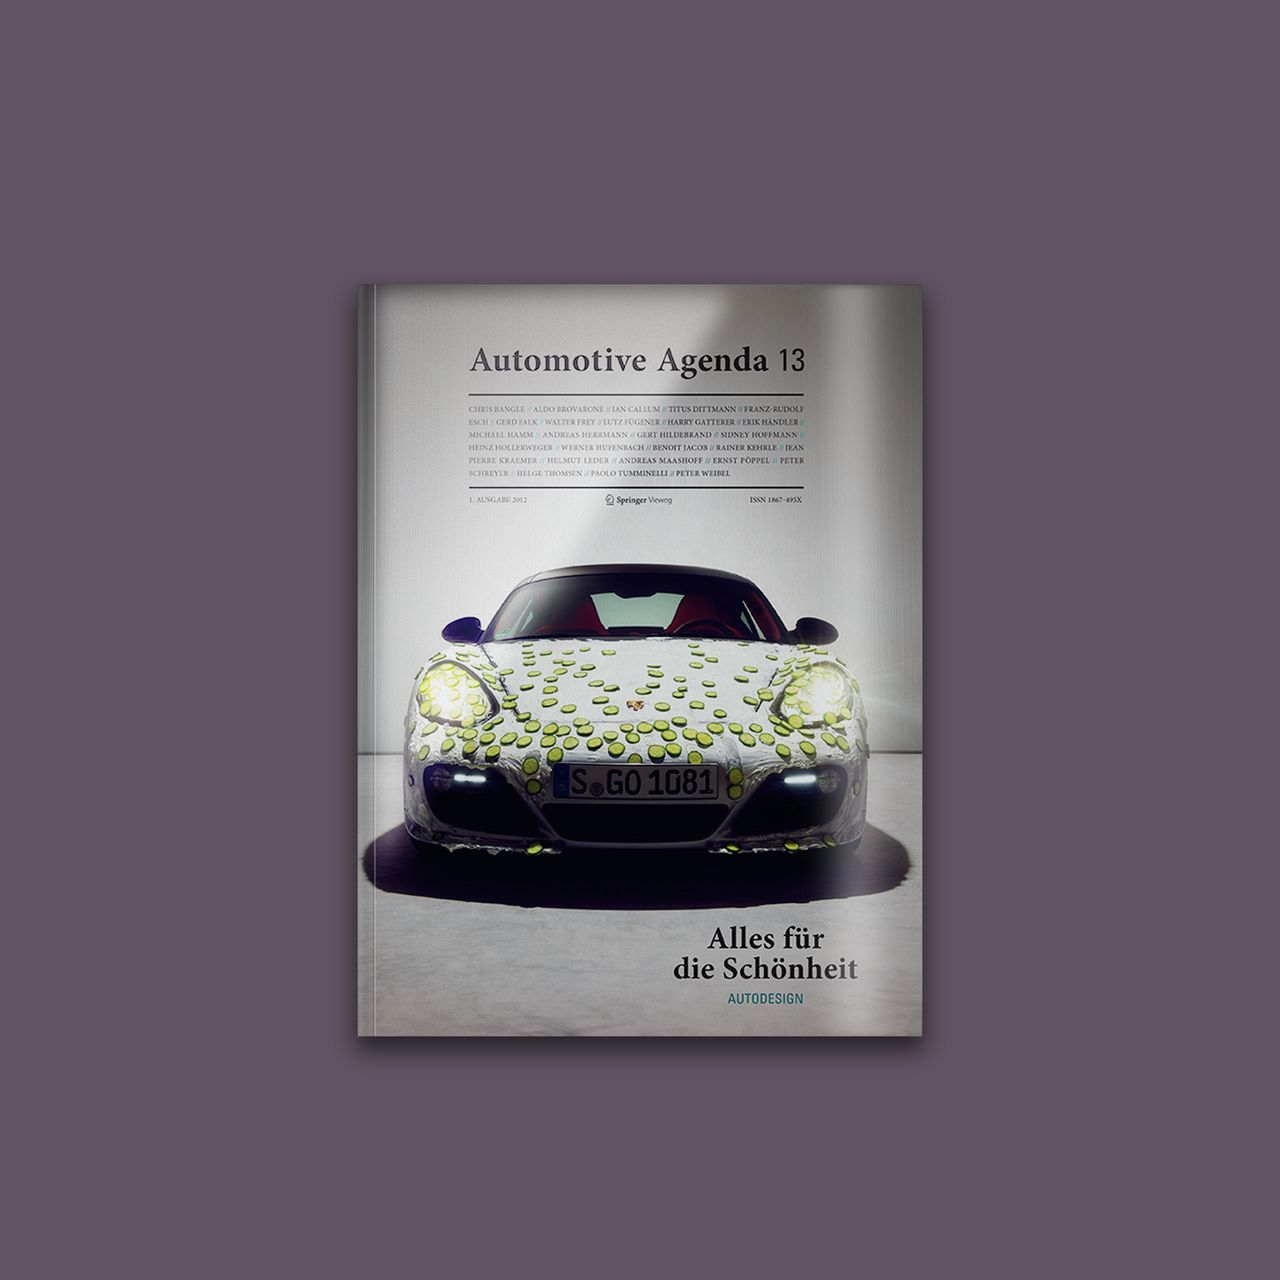 Automotive Agenda, Studio Umlaut